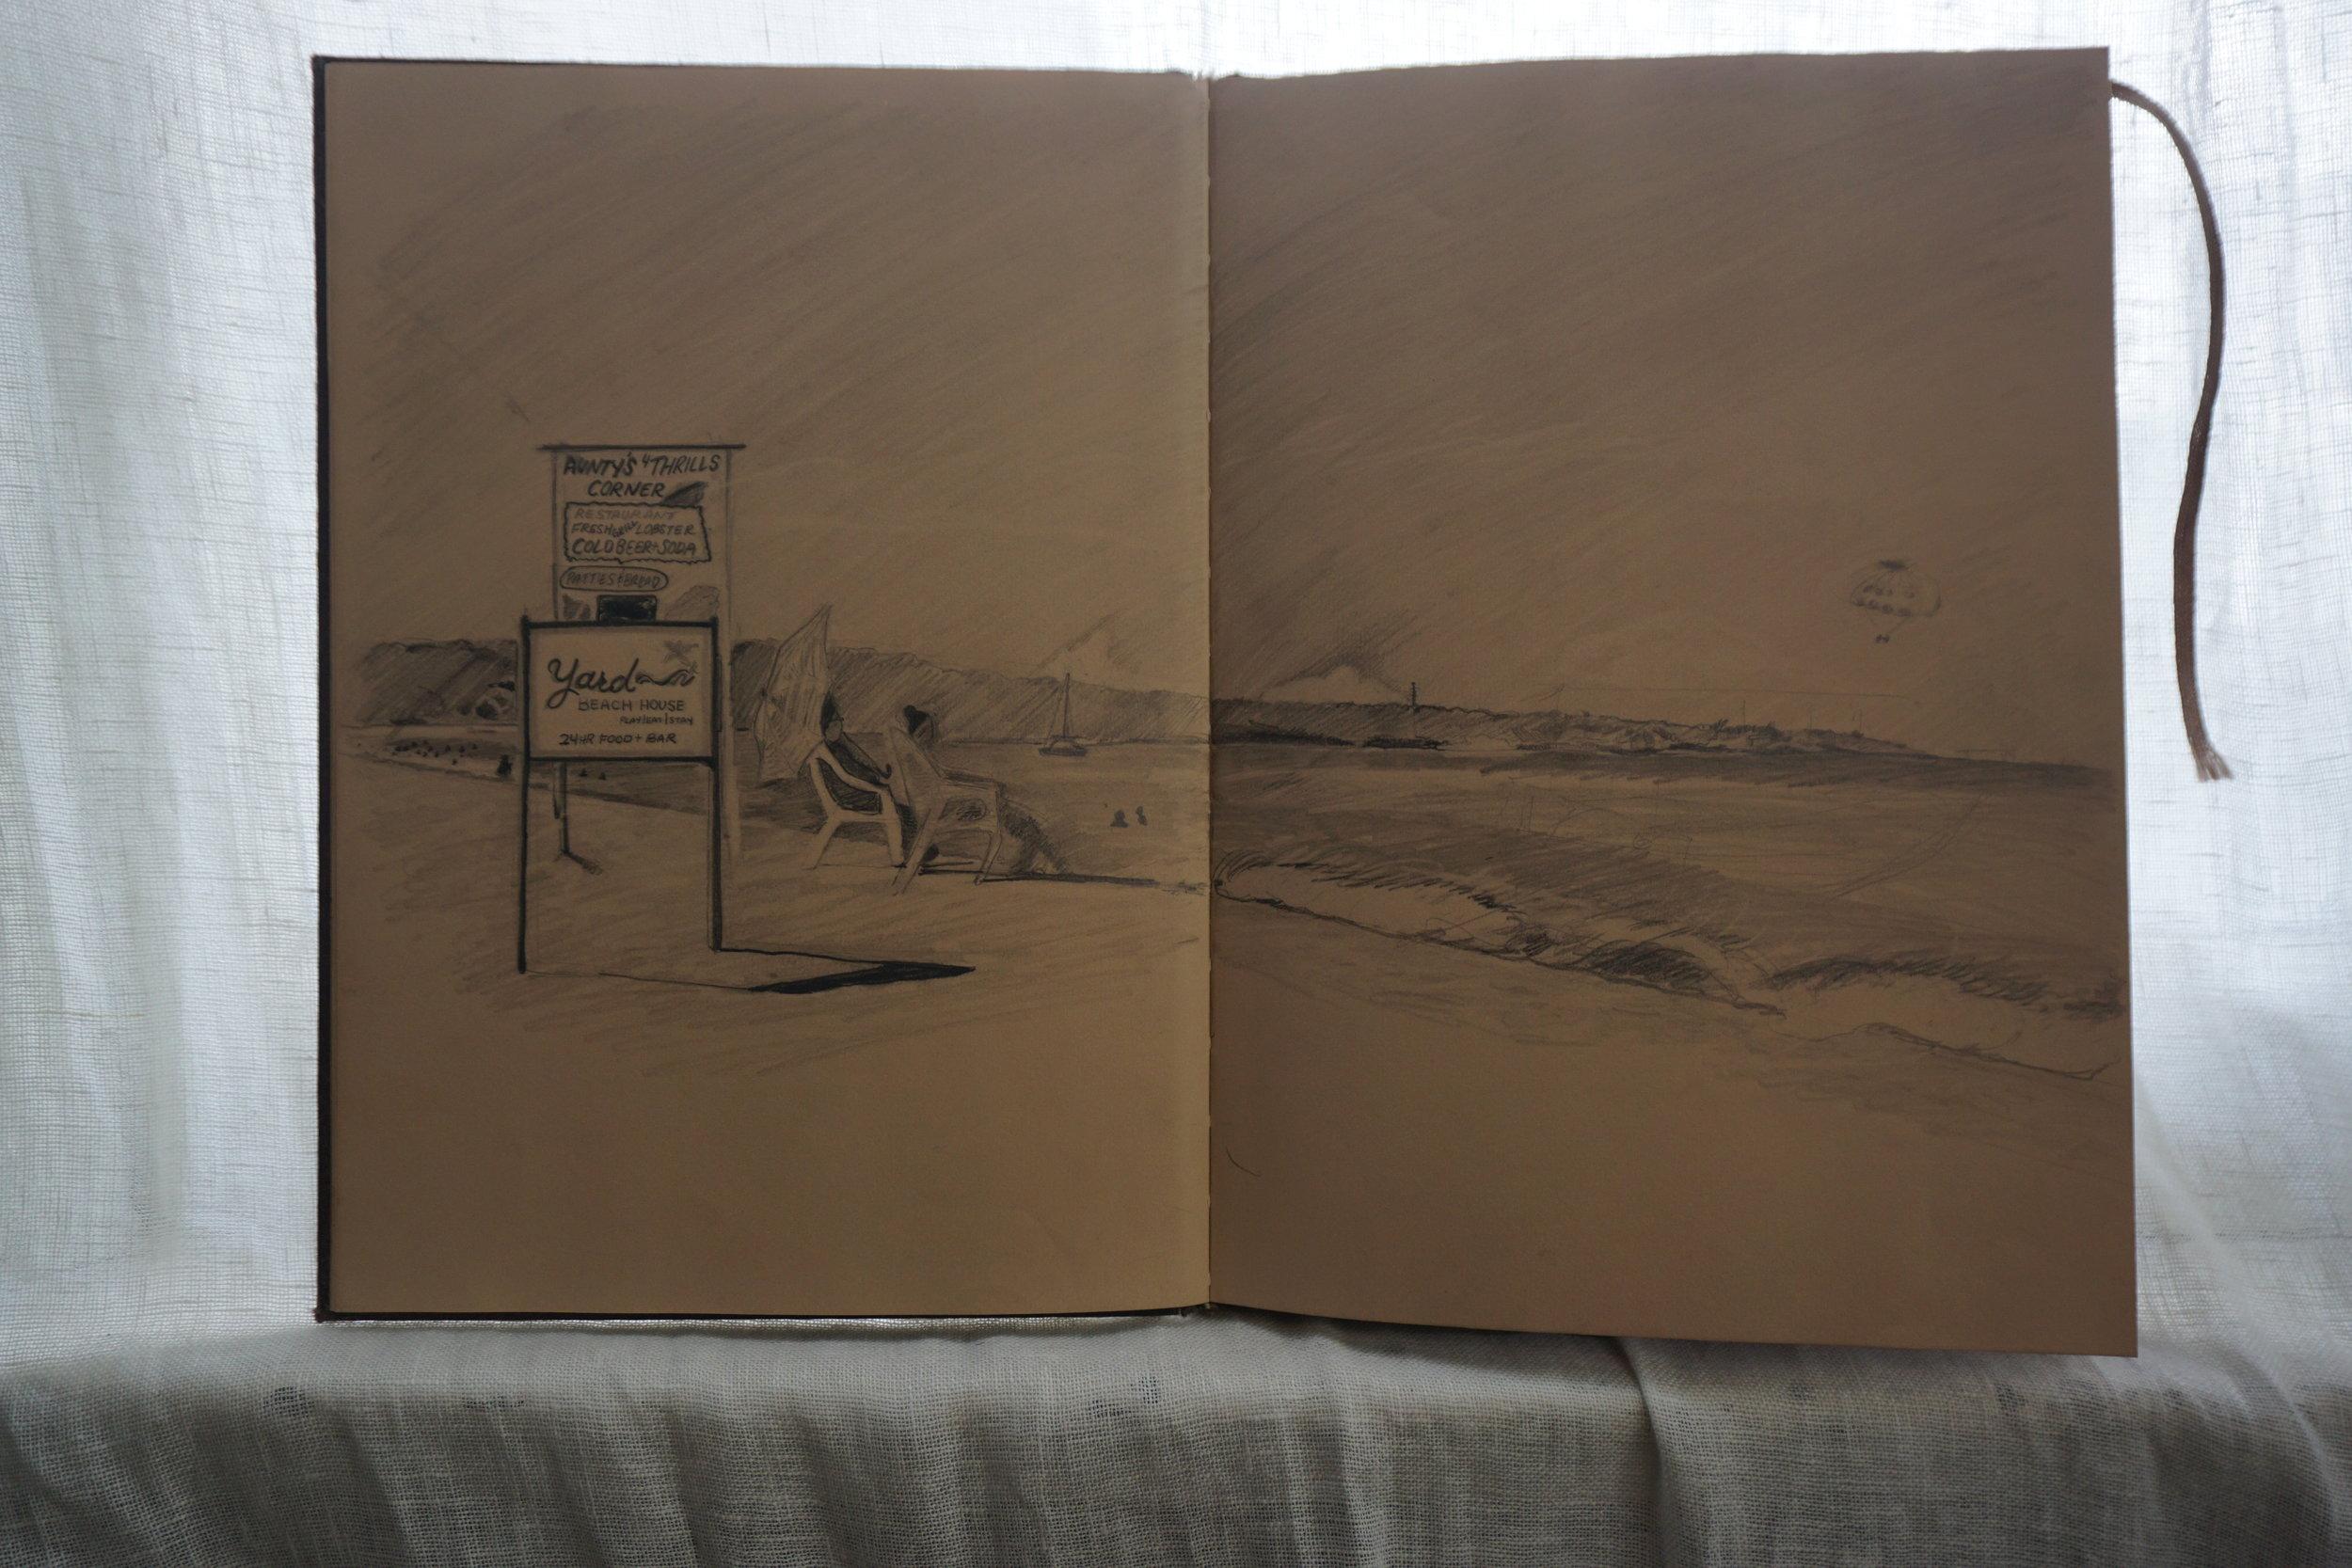 kerbi-urbanowski-sketchbook-landscape-negril-7milebeach